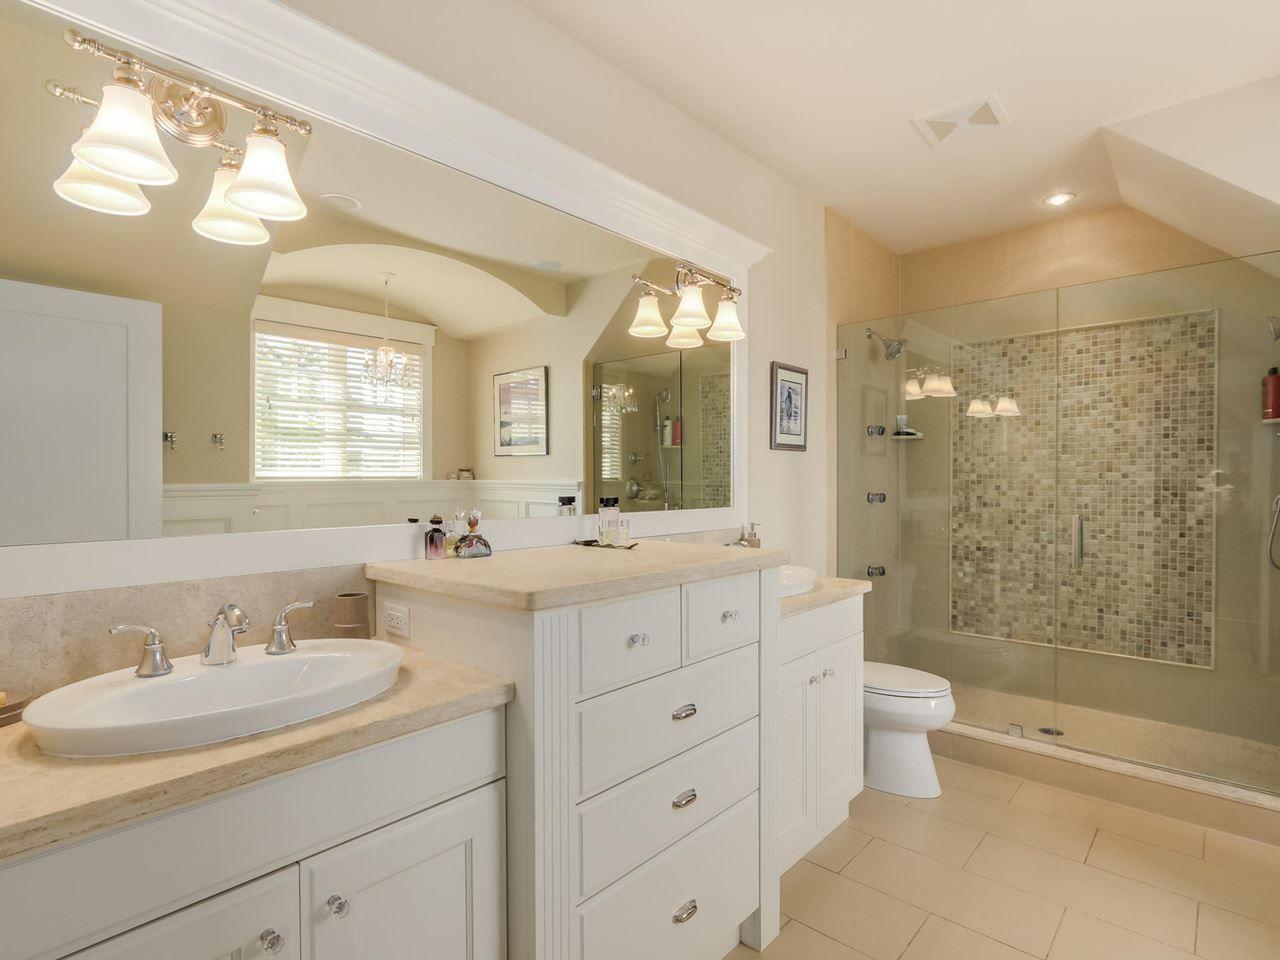 Photo 13: Photos: 13029 14 Avenue in Surrey: Crescent Bch Ocean Pk. House for sale (South Surrey White Rock)  : MLS®# R2070160